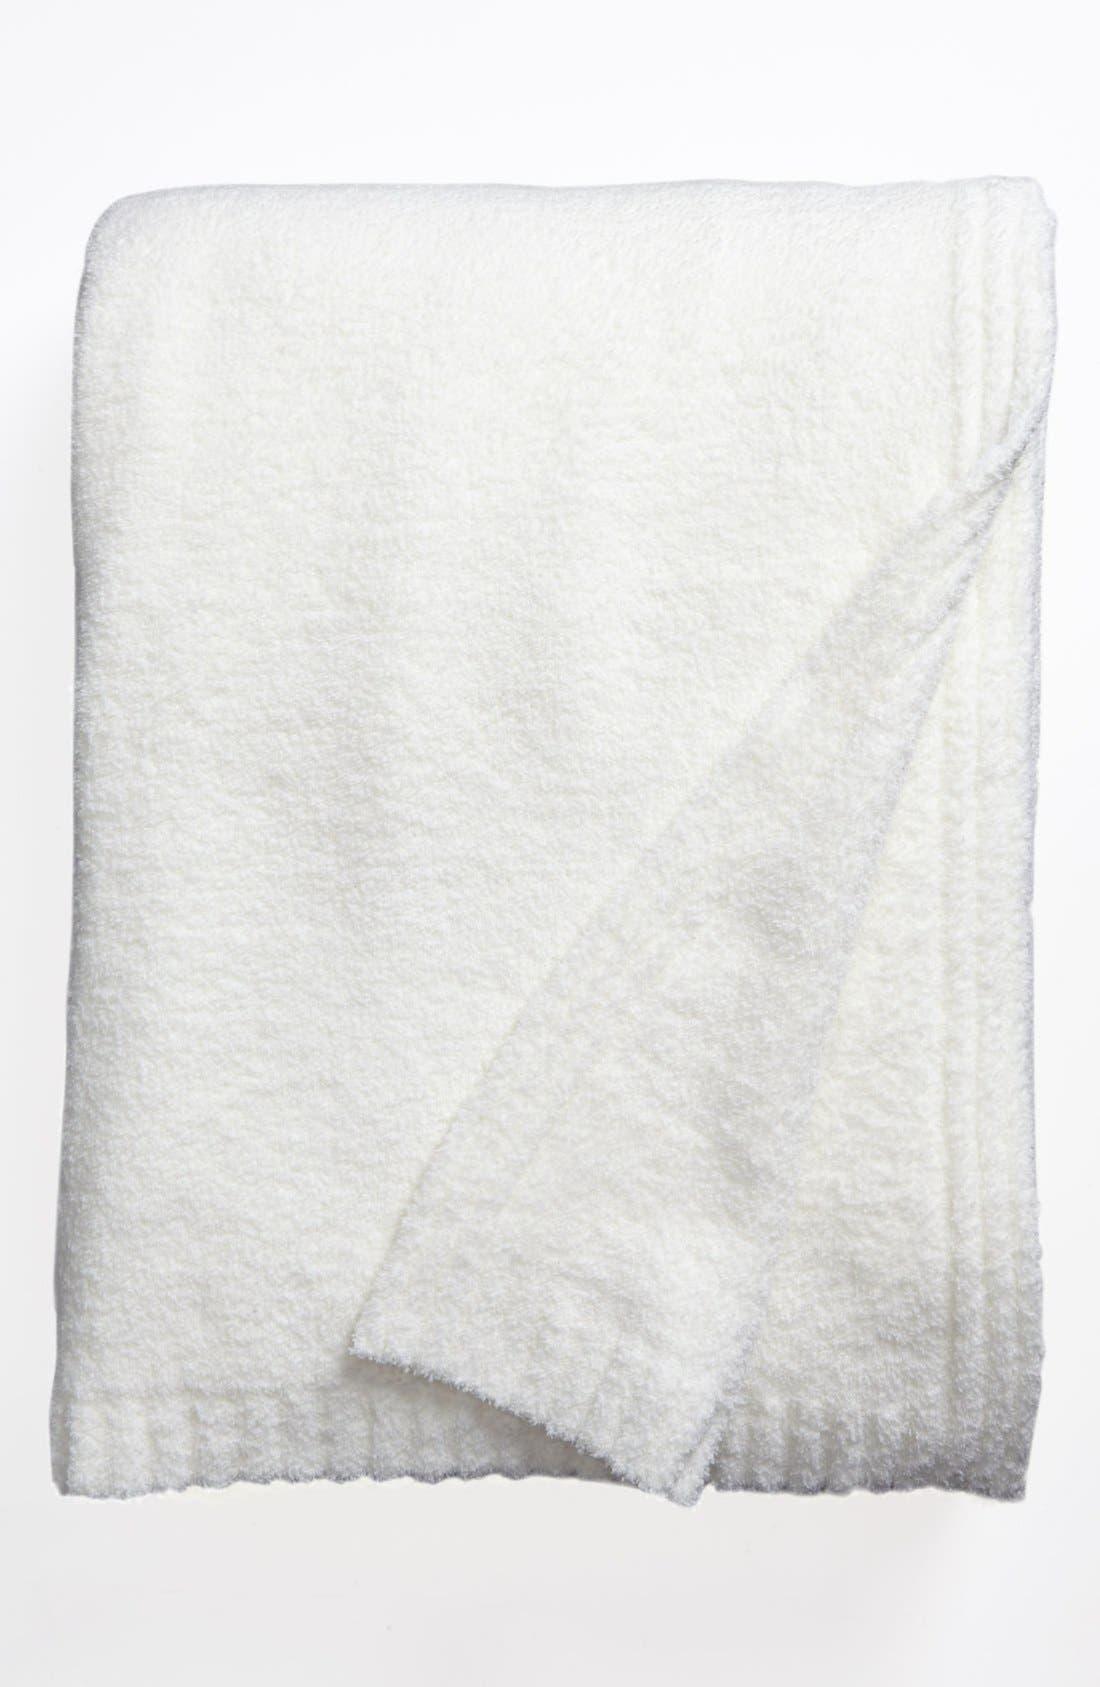 Main Image - Nordstrom at Home 'Butter' Knit Blanket